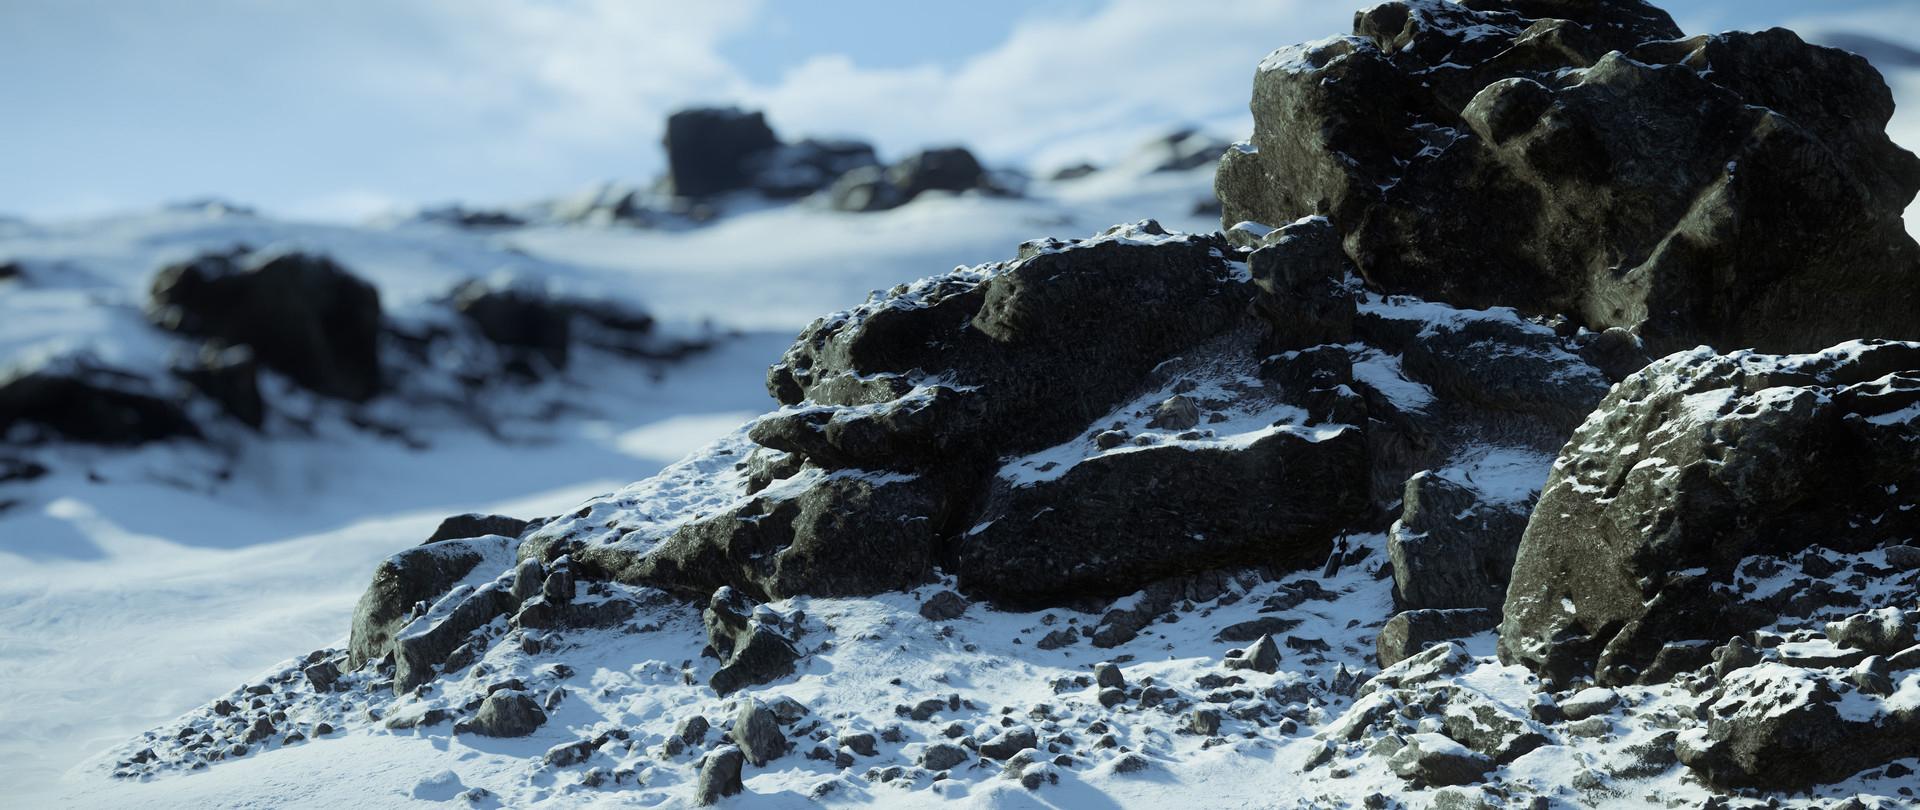 Cryengine render snow landscape